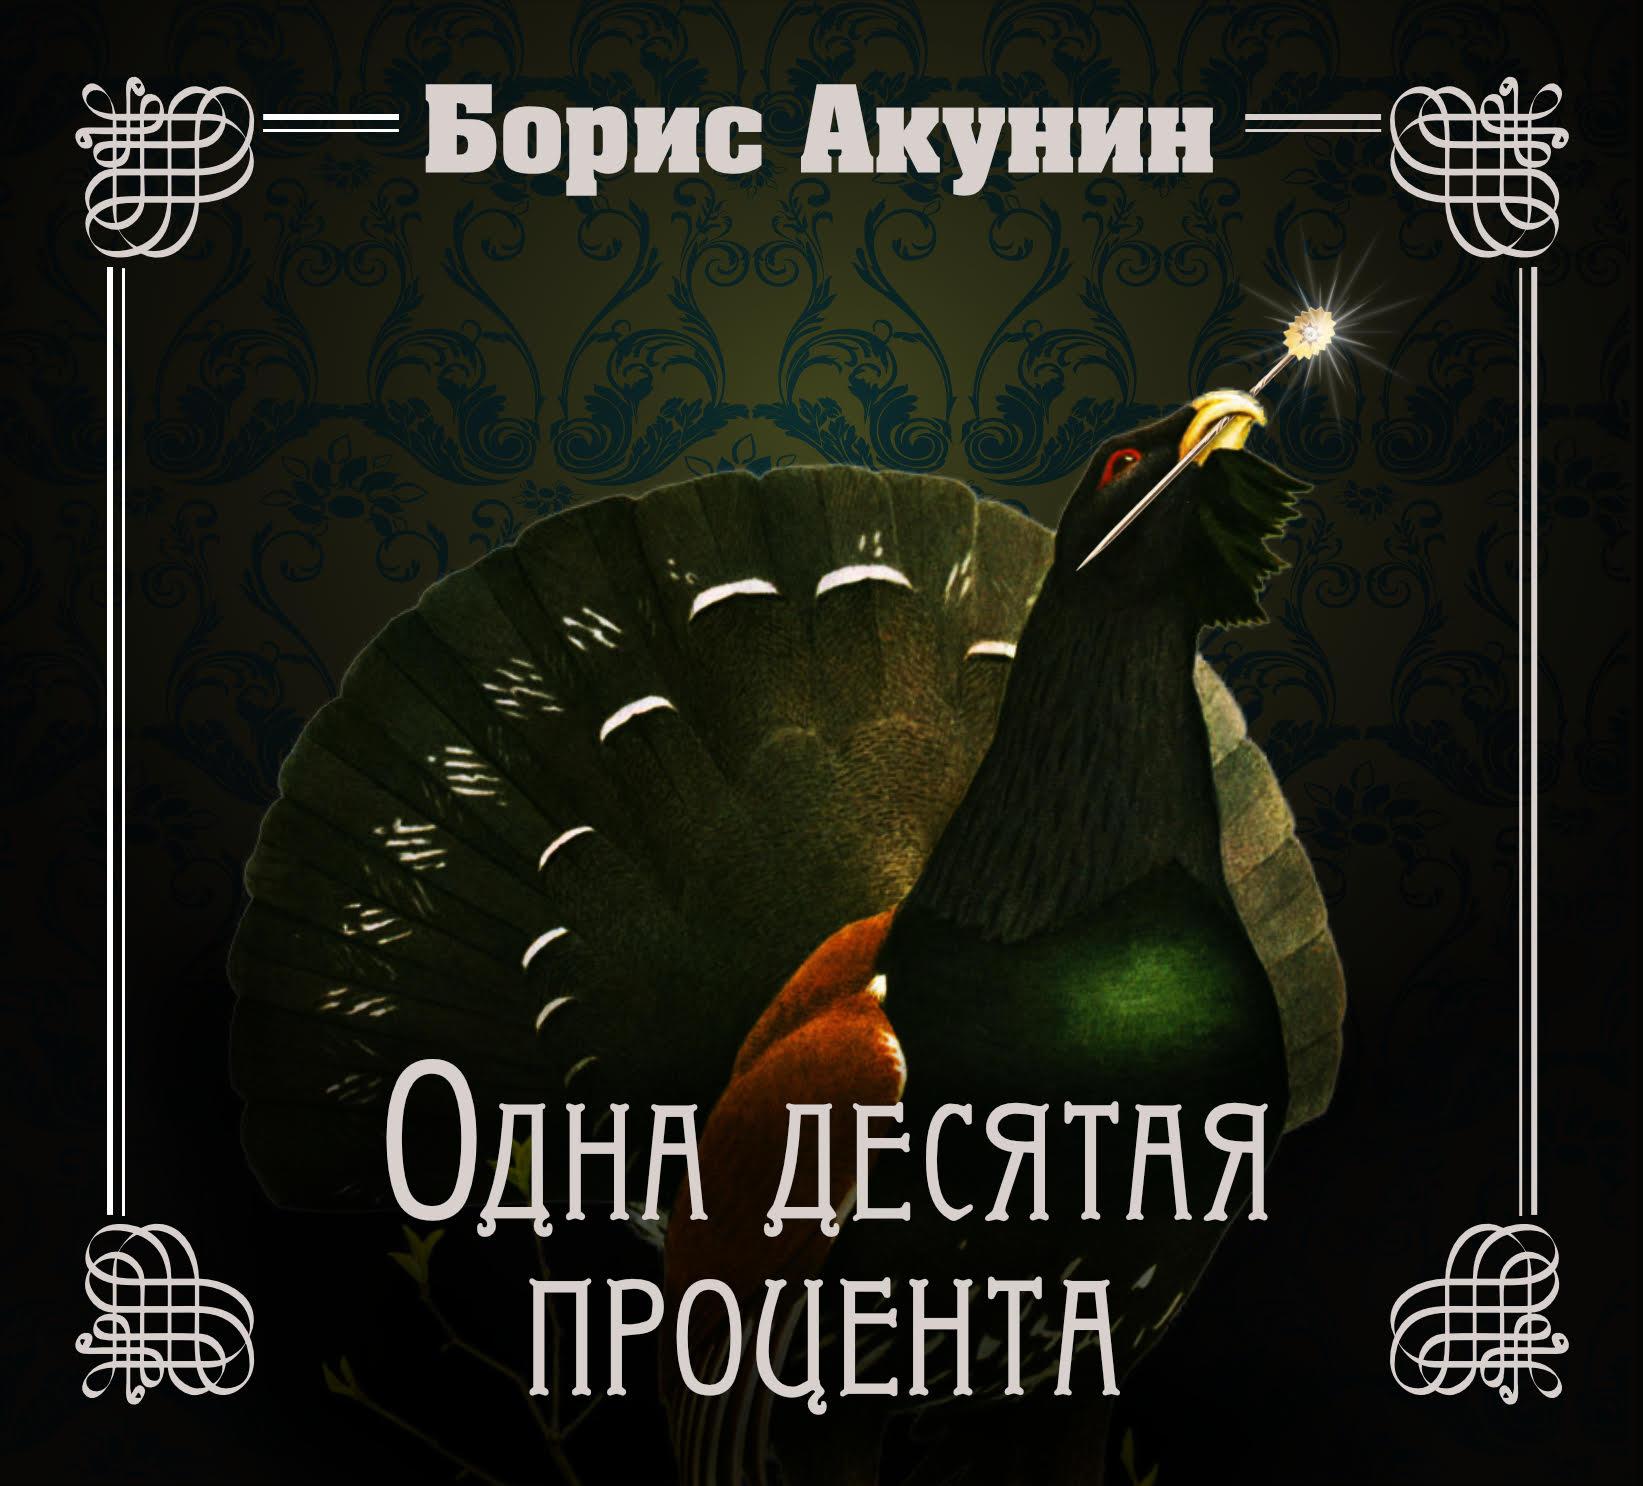 Купить книгу Одна десятая процента, автора Бориса Акунина